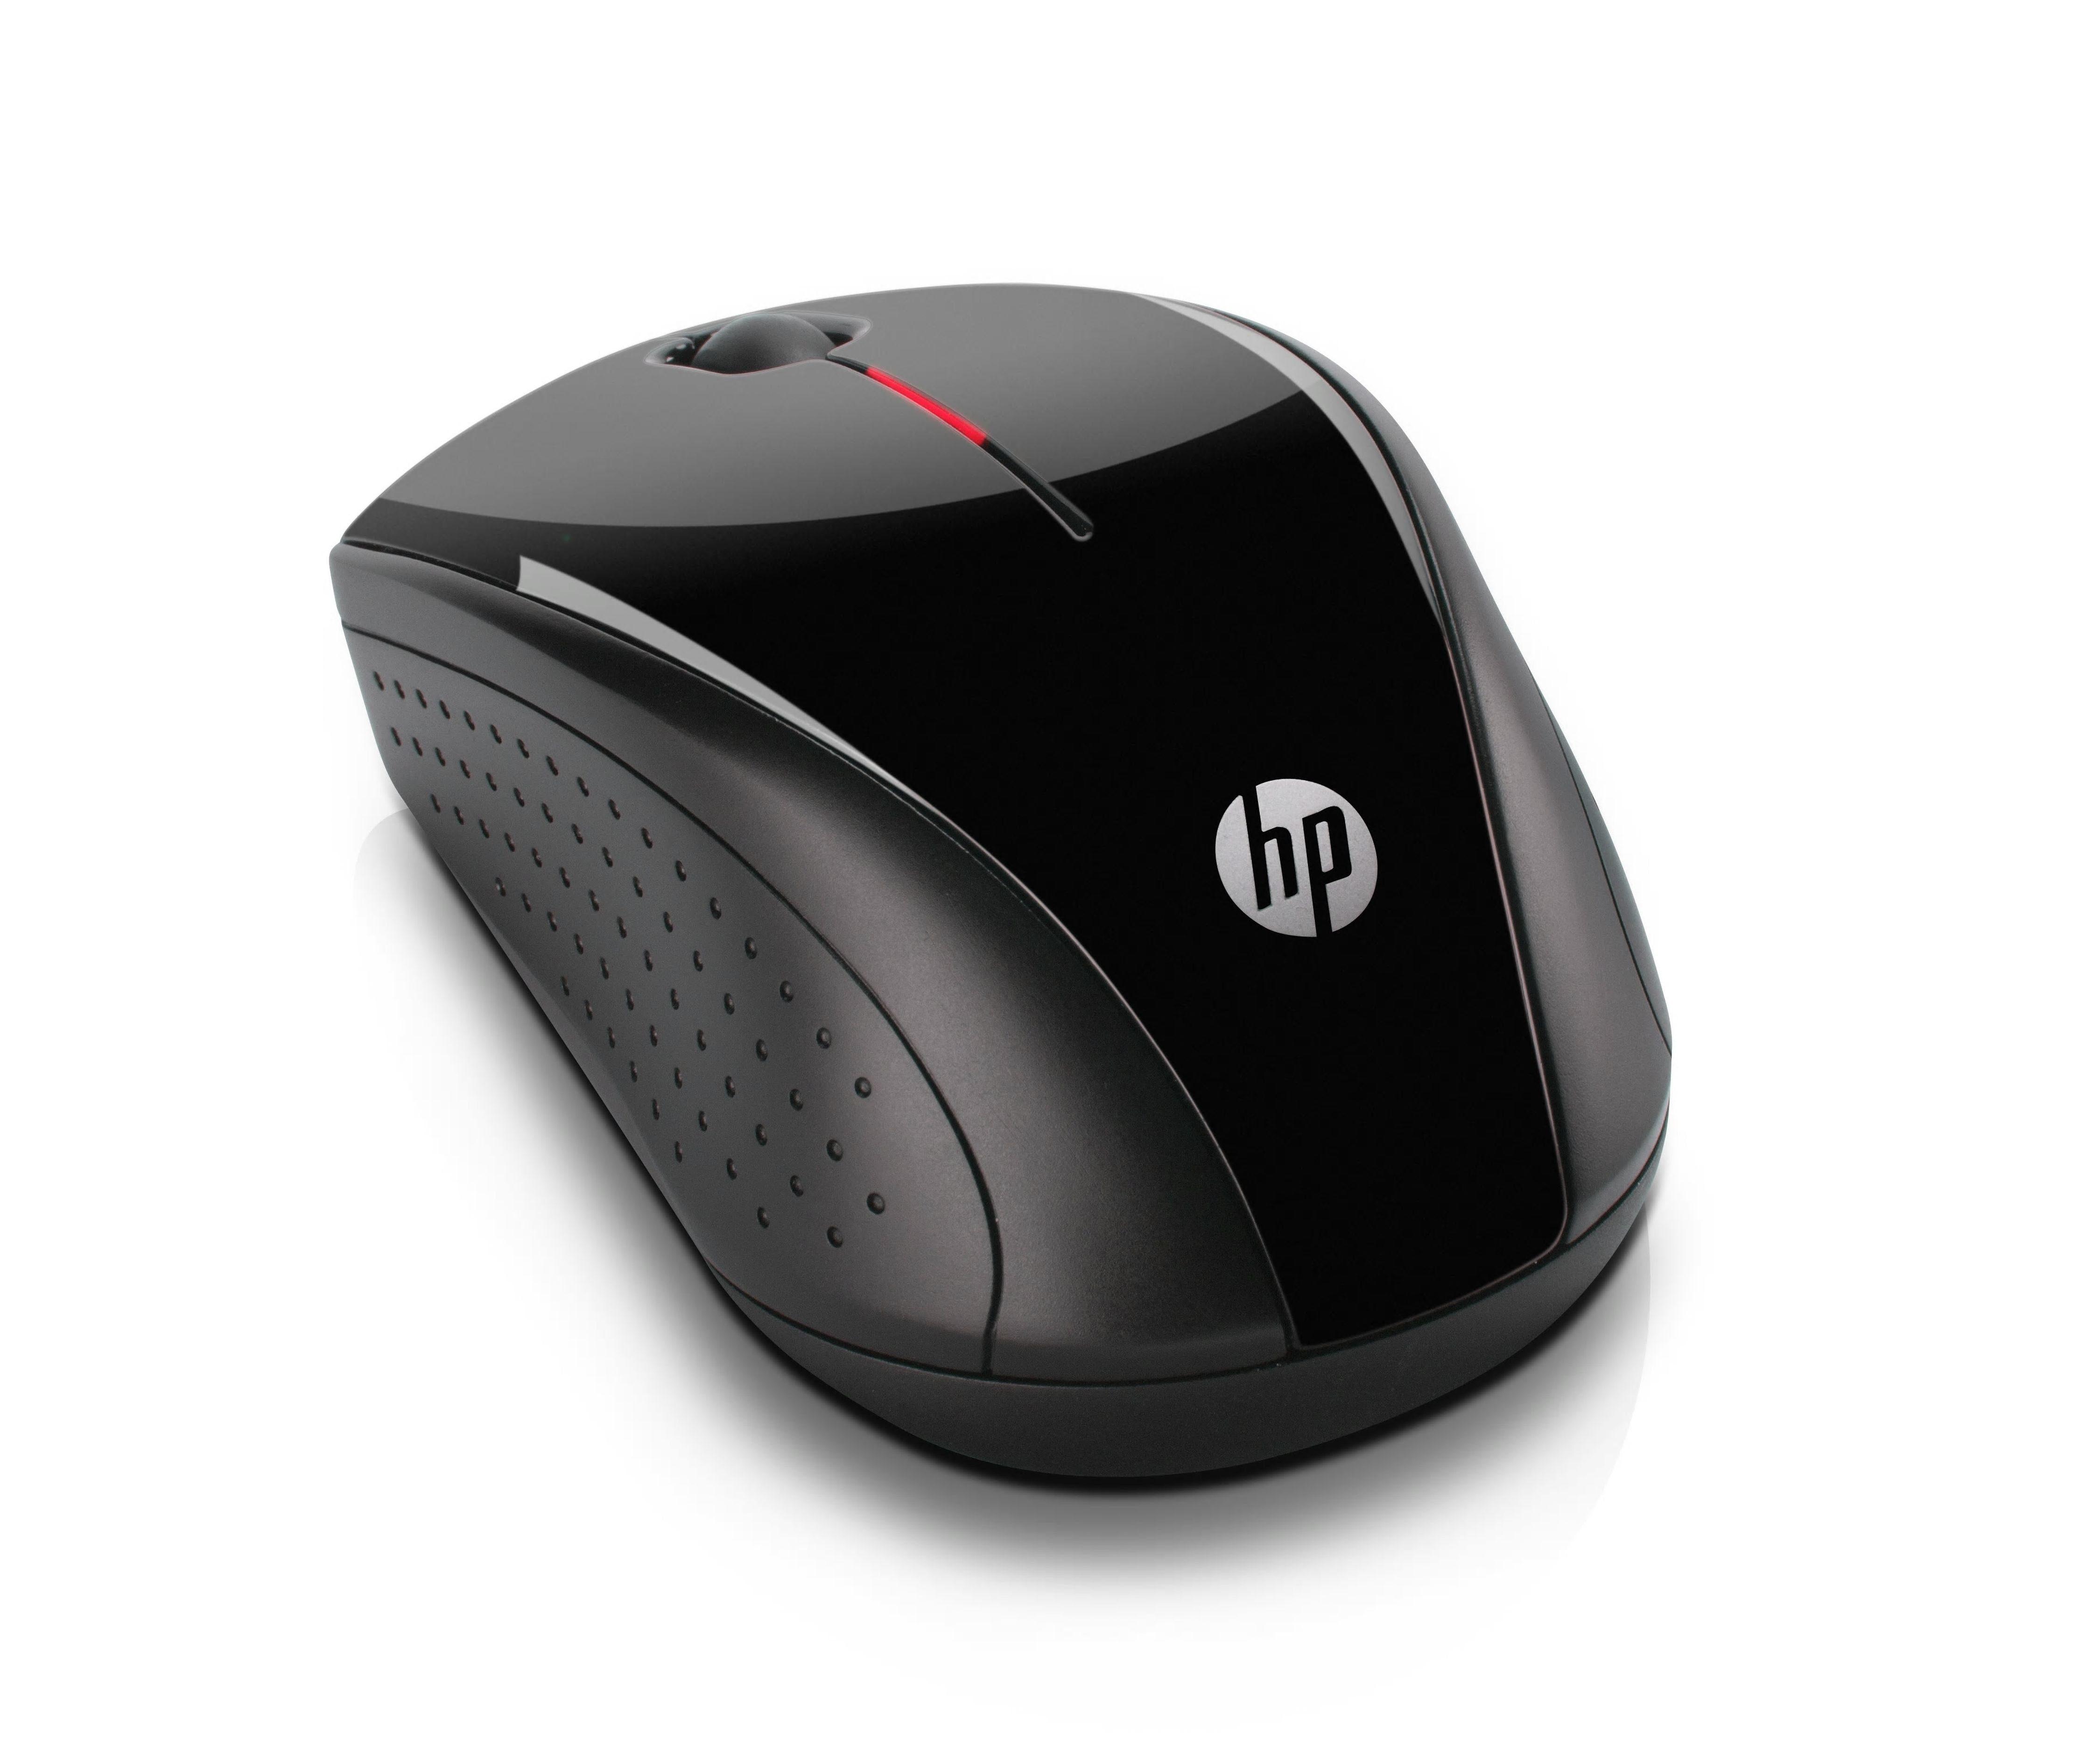 HP HP X3000 Drahtlose Maus »X3000 Drahtlose Maus«